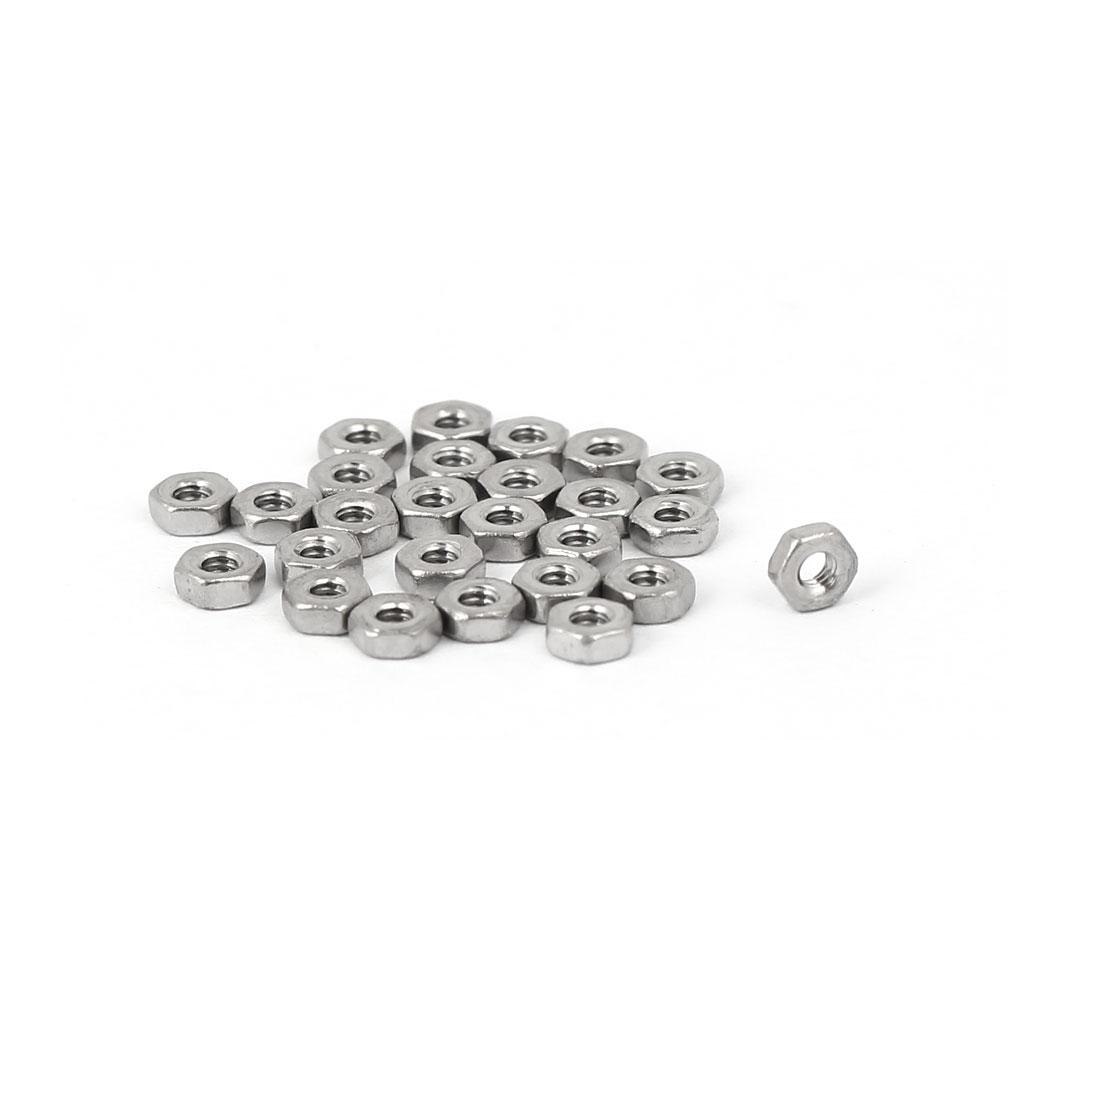 M1.6 Thread Dia 304 Stainless Steel Hex Nut Screw cap Fastener Silver Tone 25pcs